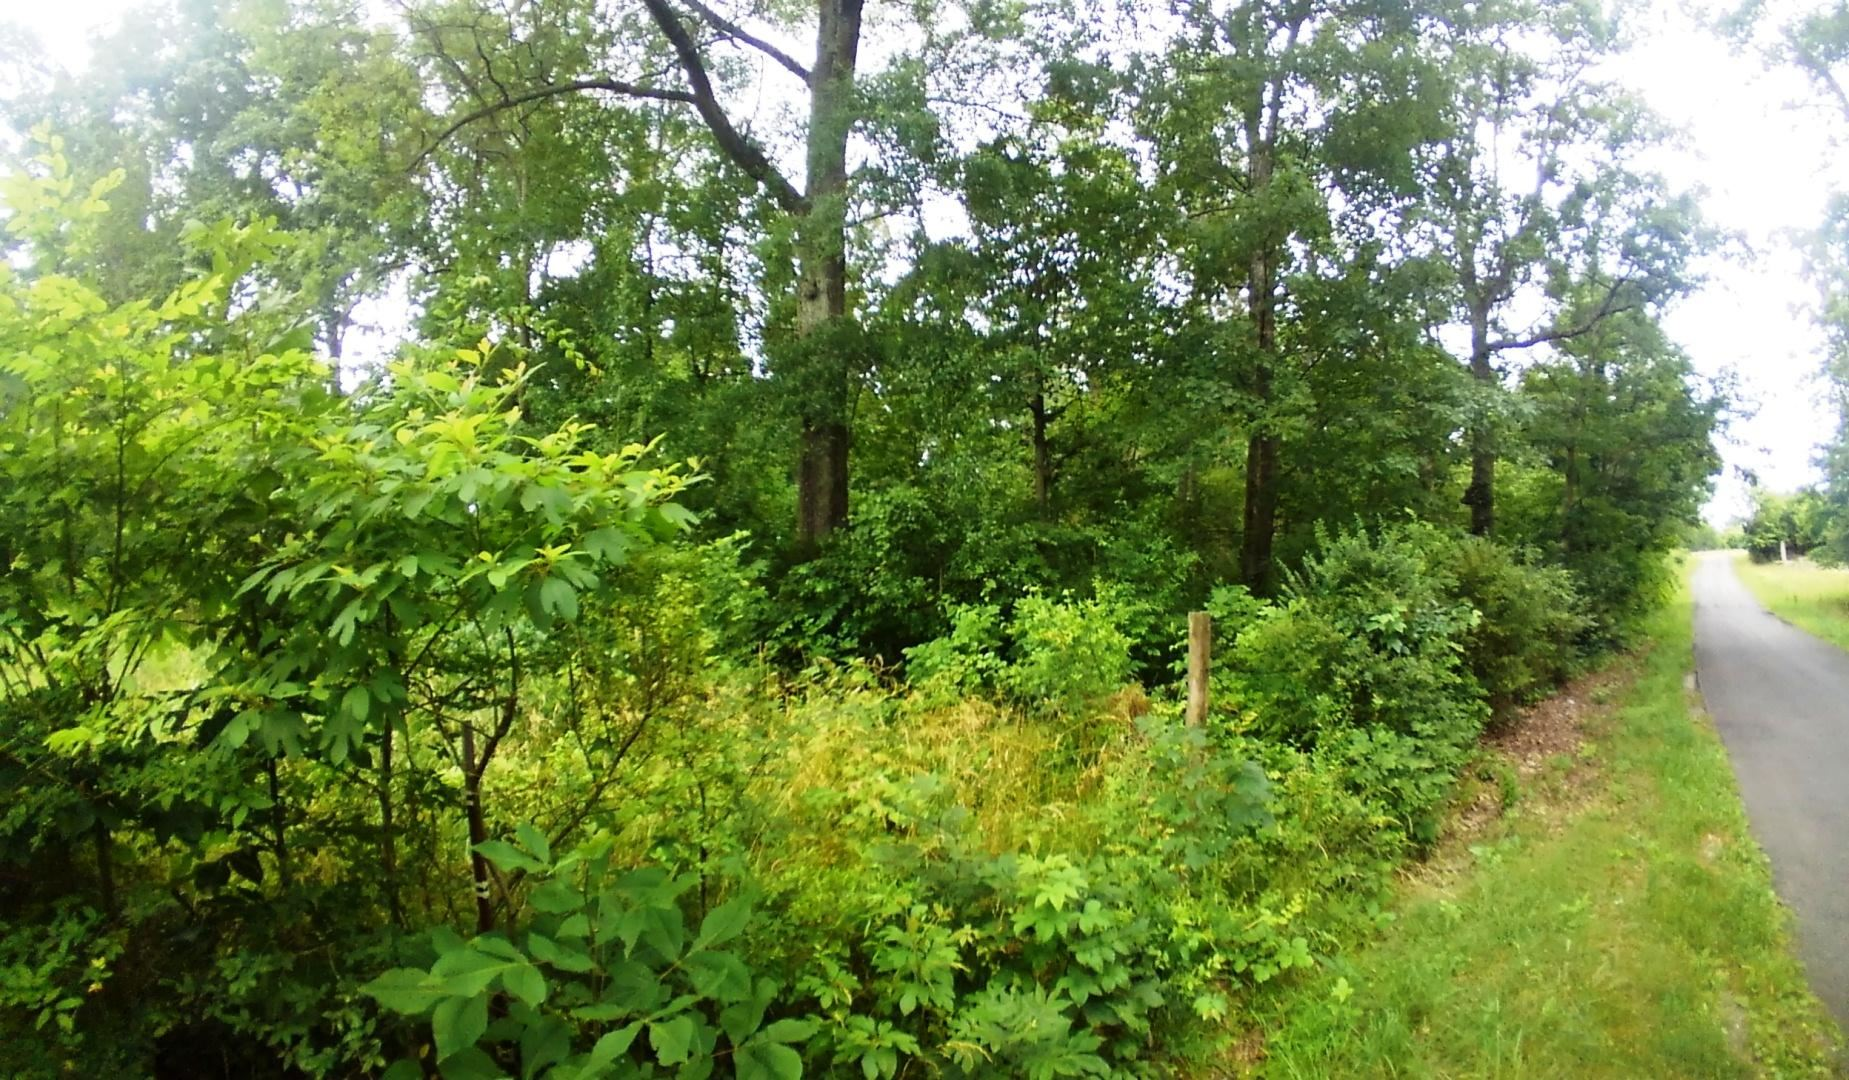 Photo of Lot 10 Smelcer Road, Mosheim, TN 37810 (MLS # 267371)